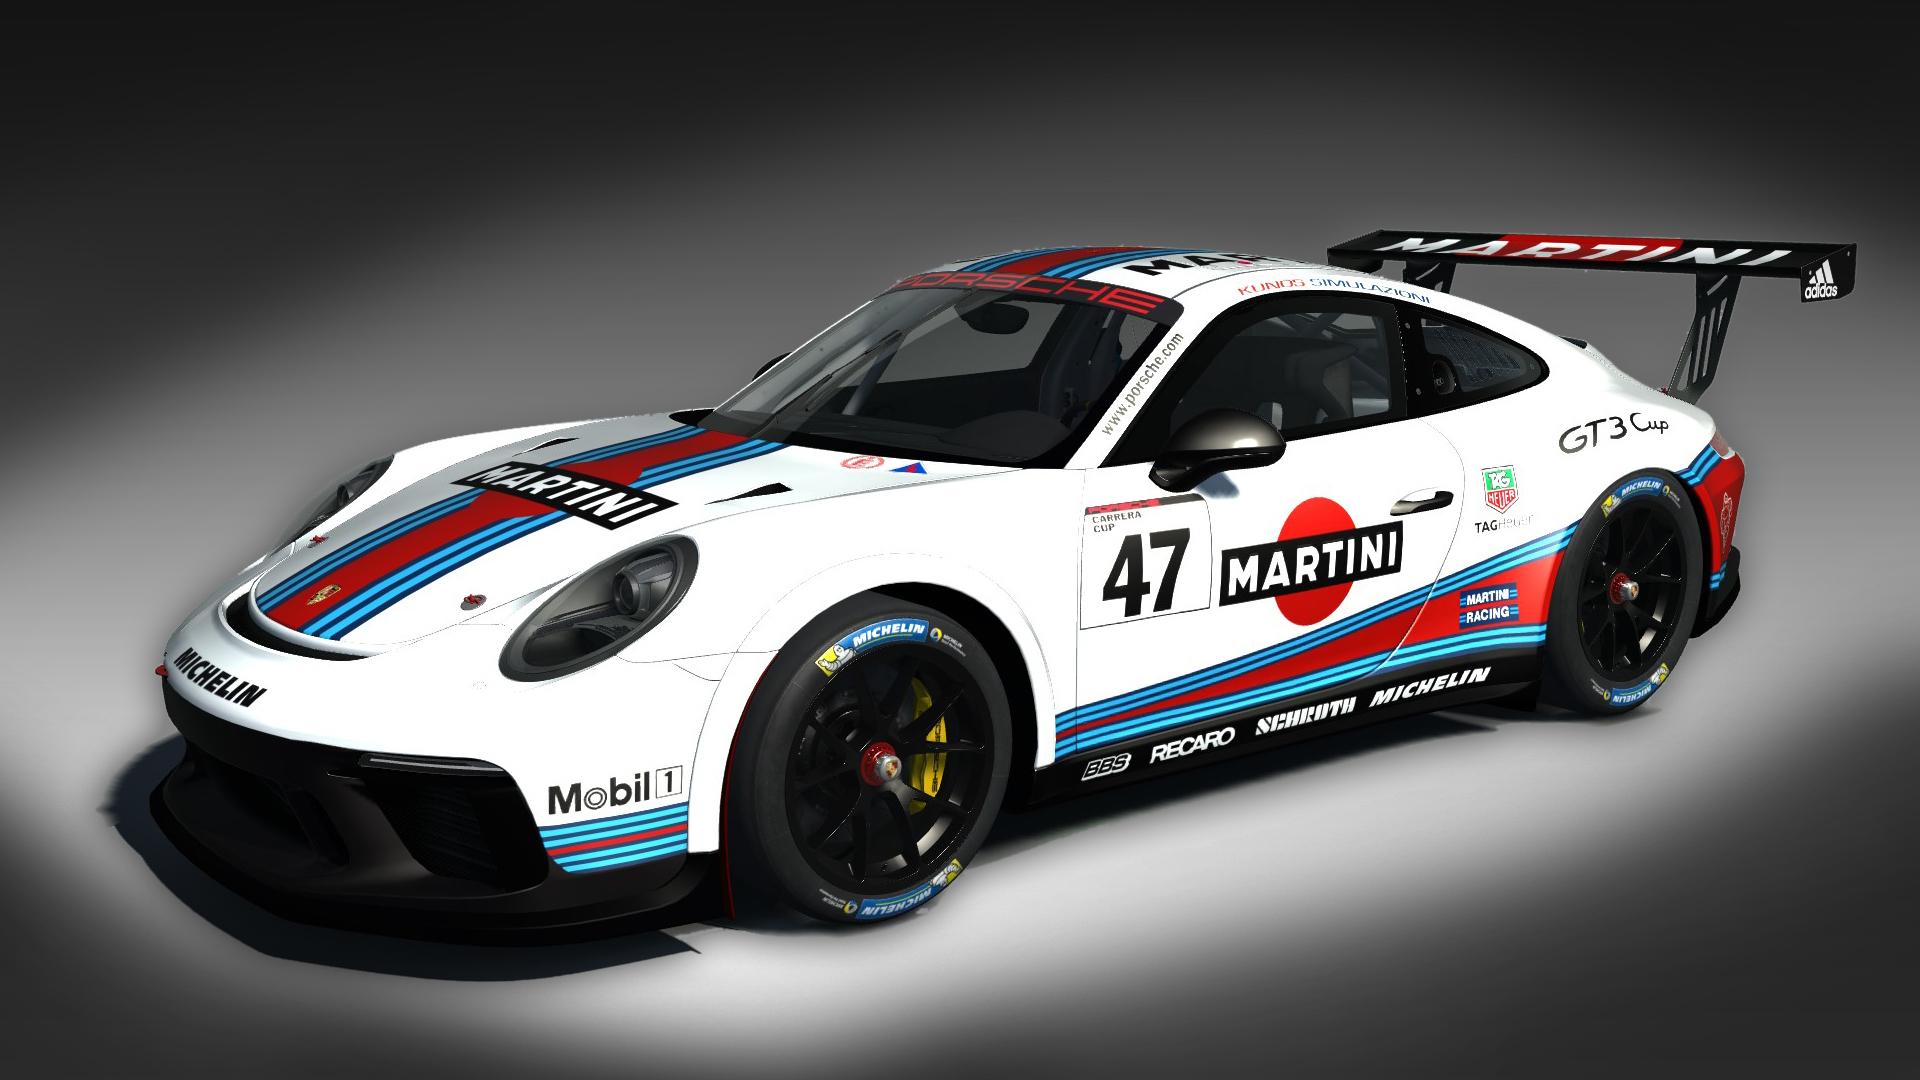 KS_Porsche_911_Cup_2017_Martini_47.jpg